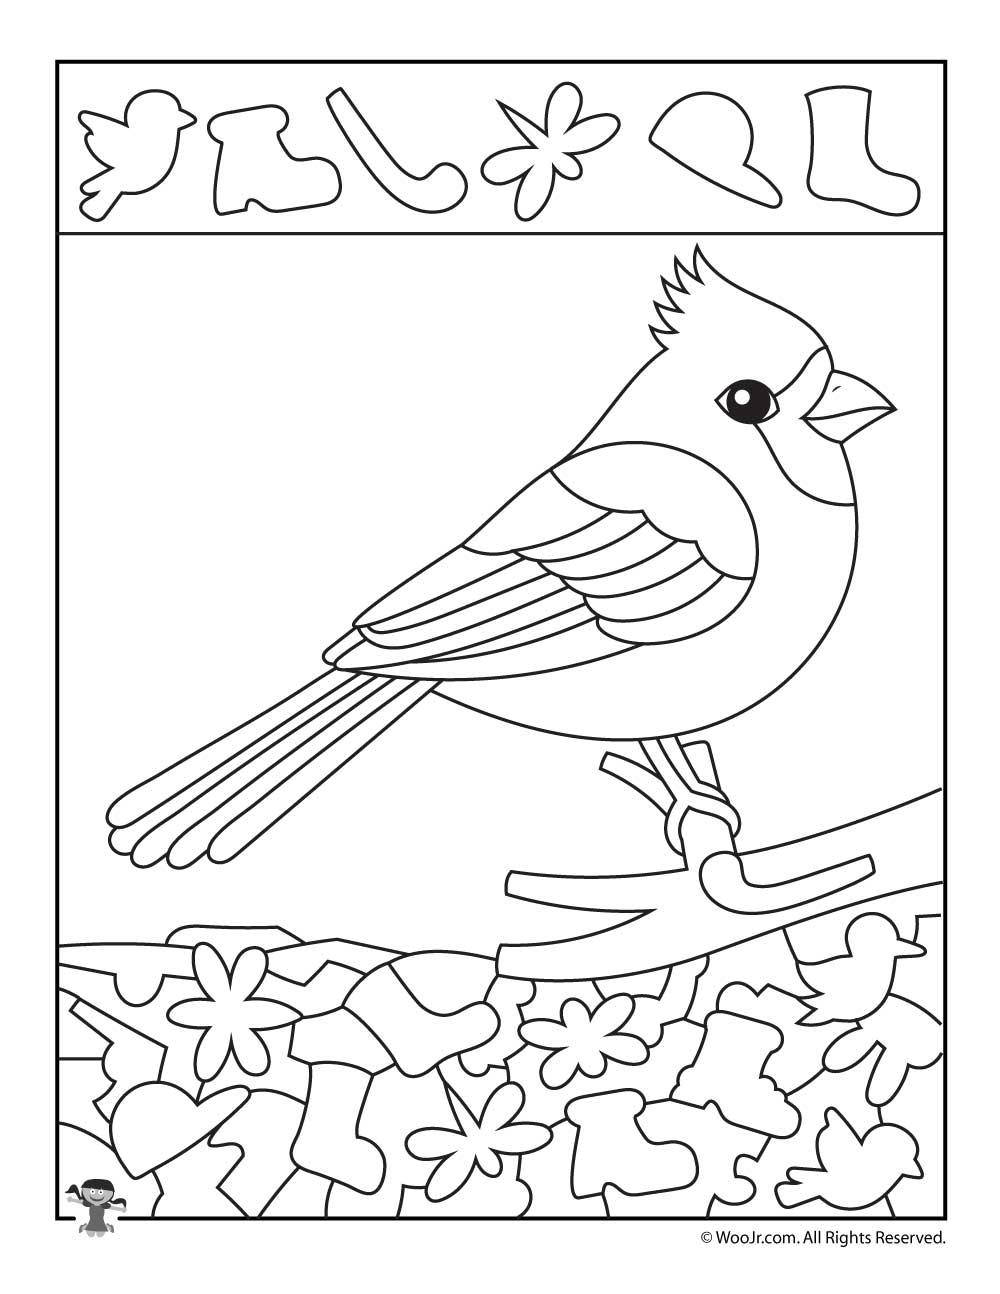 usable bird beak activity worksheet. Black Bedroom Furniture Sets. Home Design Ideas